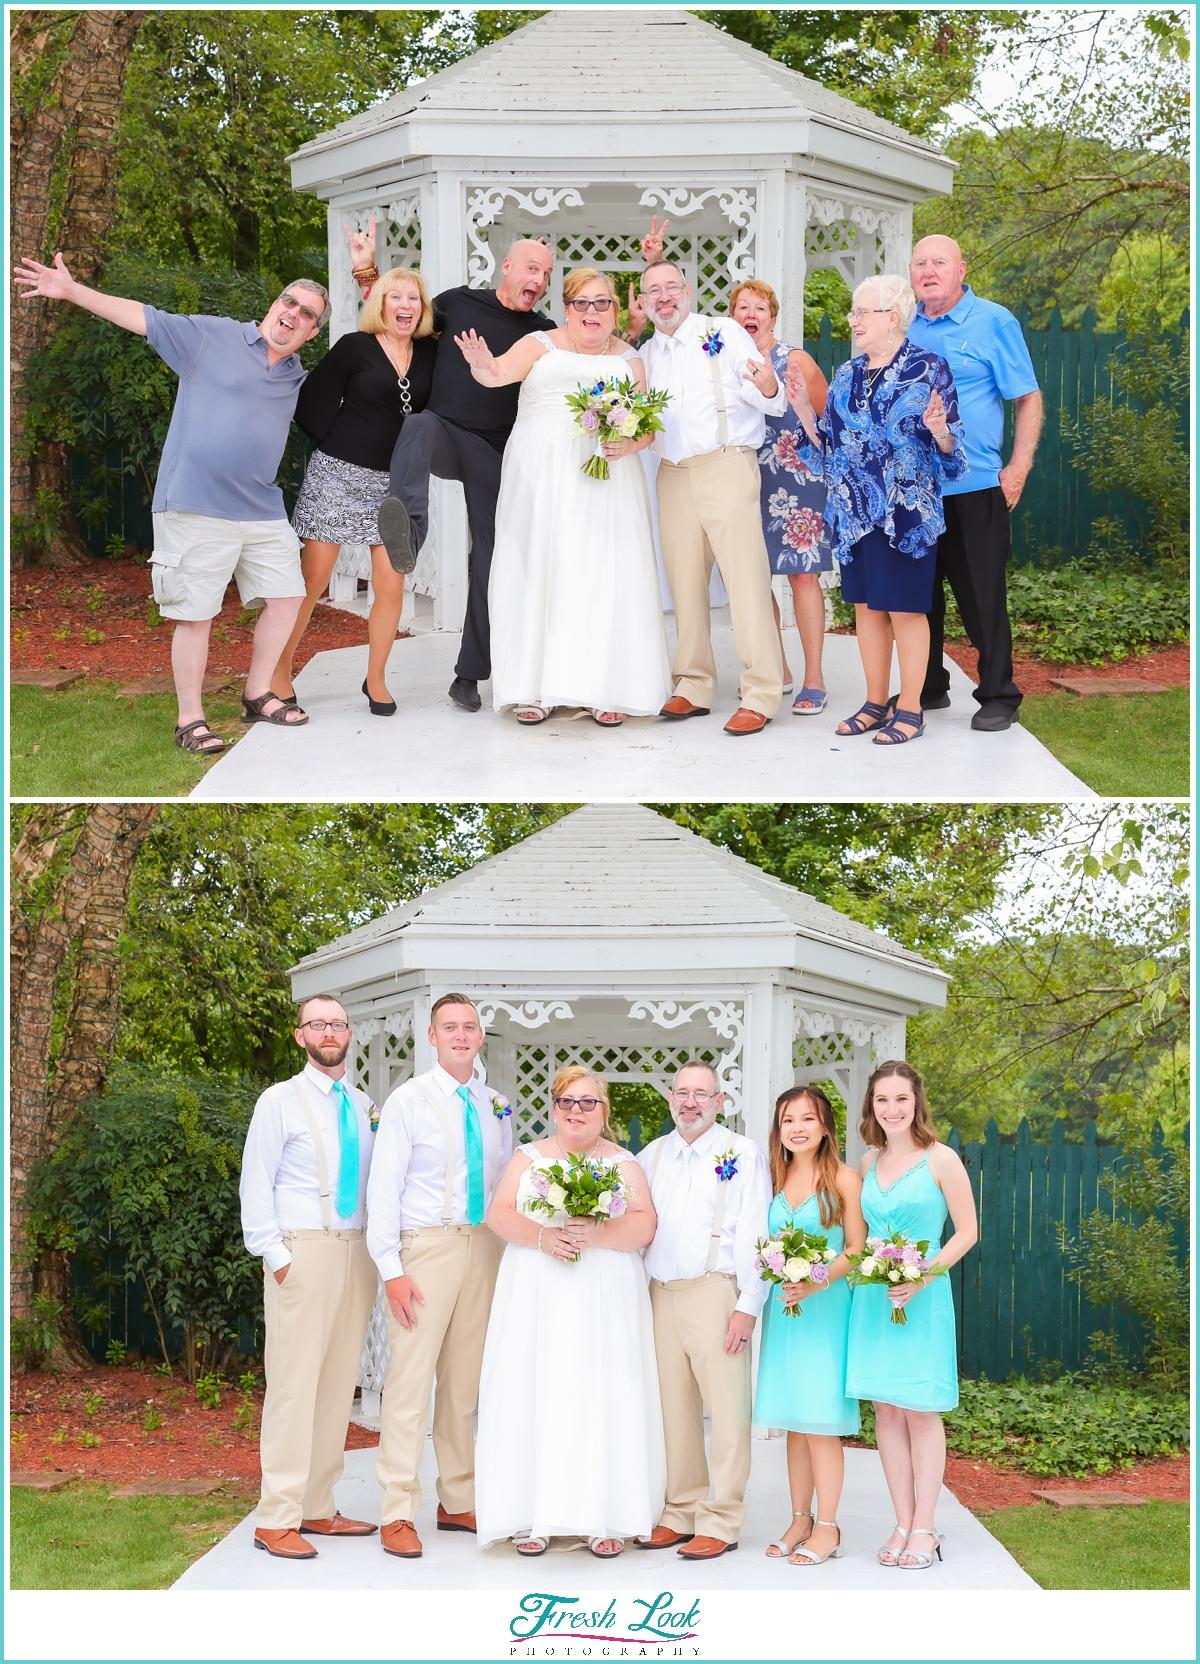 fun photos after the wedding